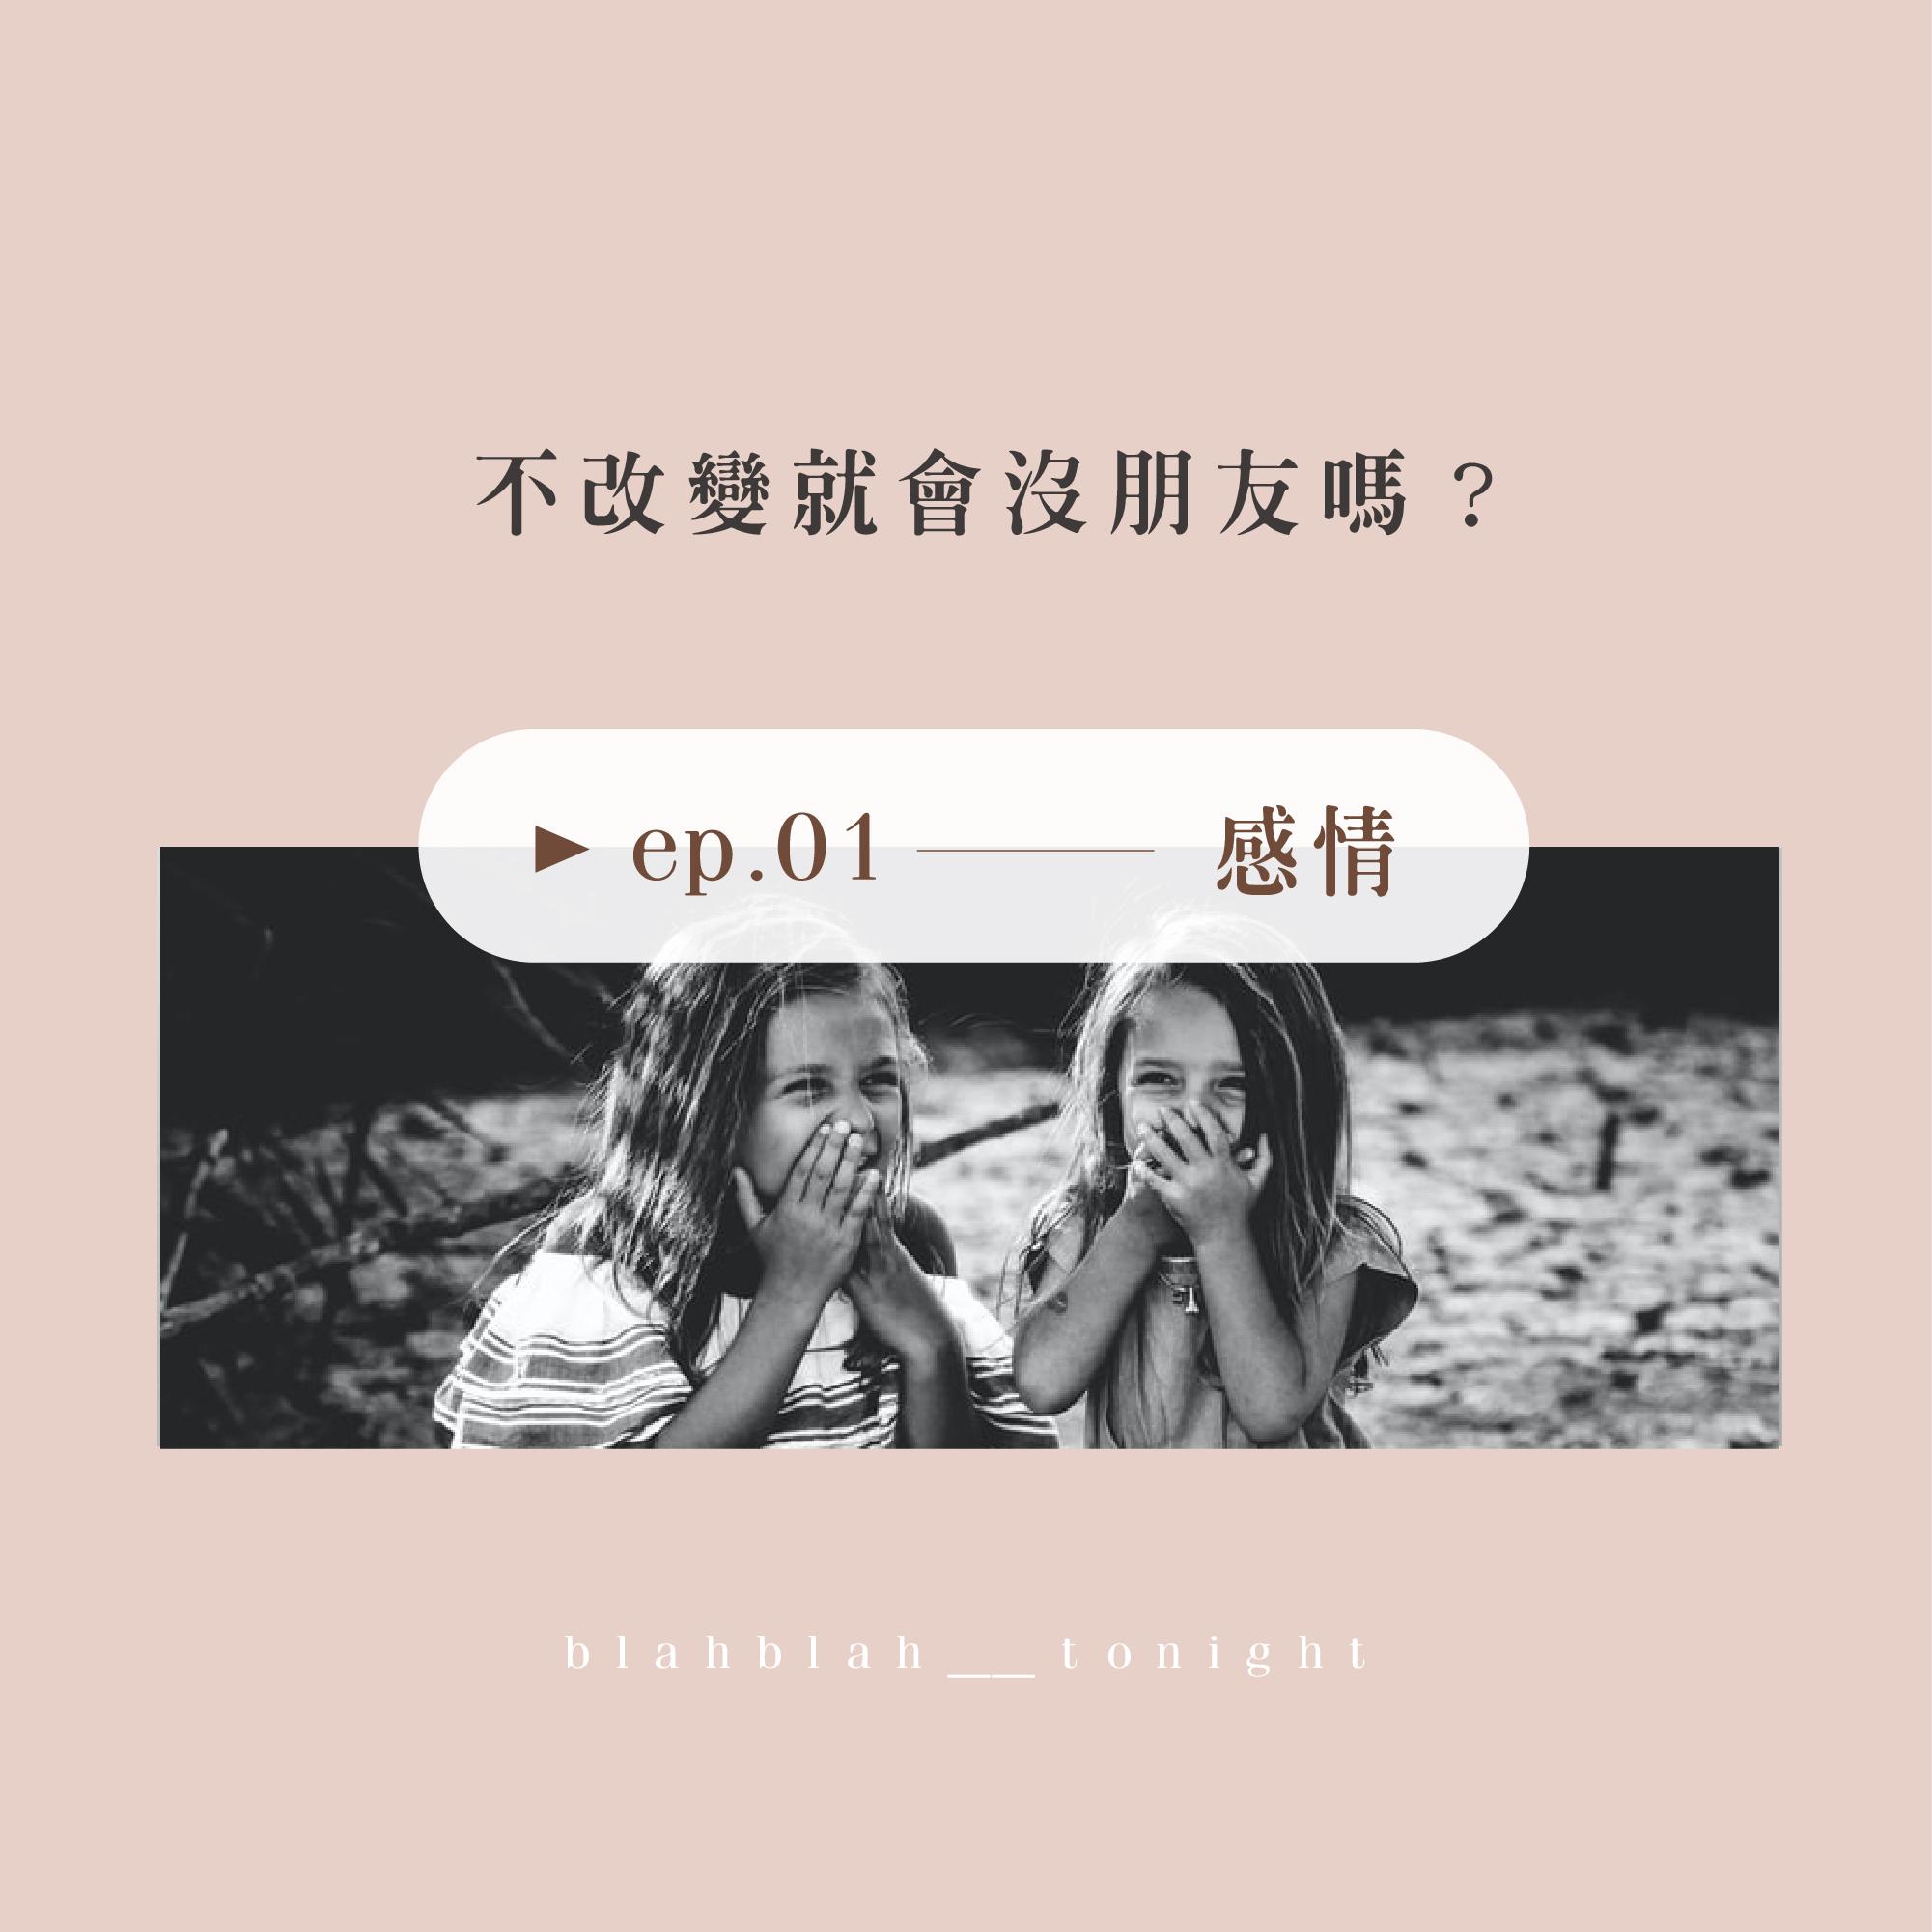 ep.01 感情 不改變就會沒朋友嗎?